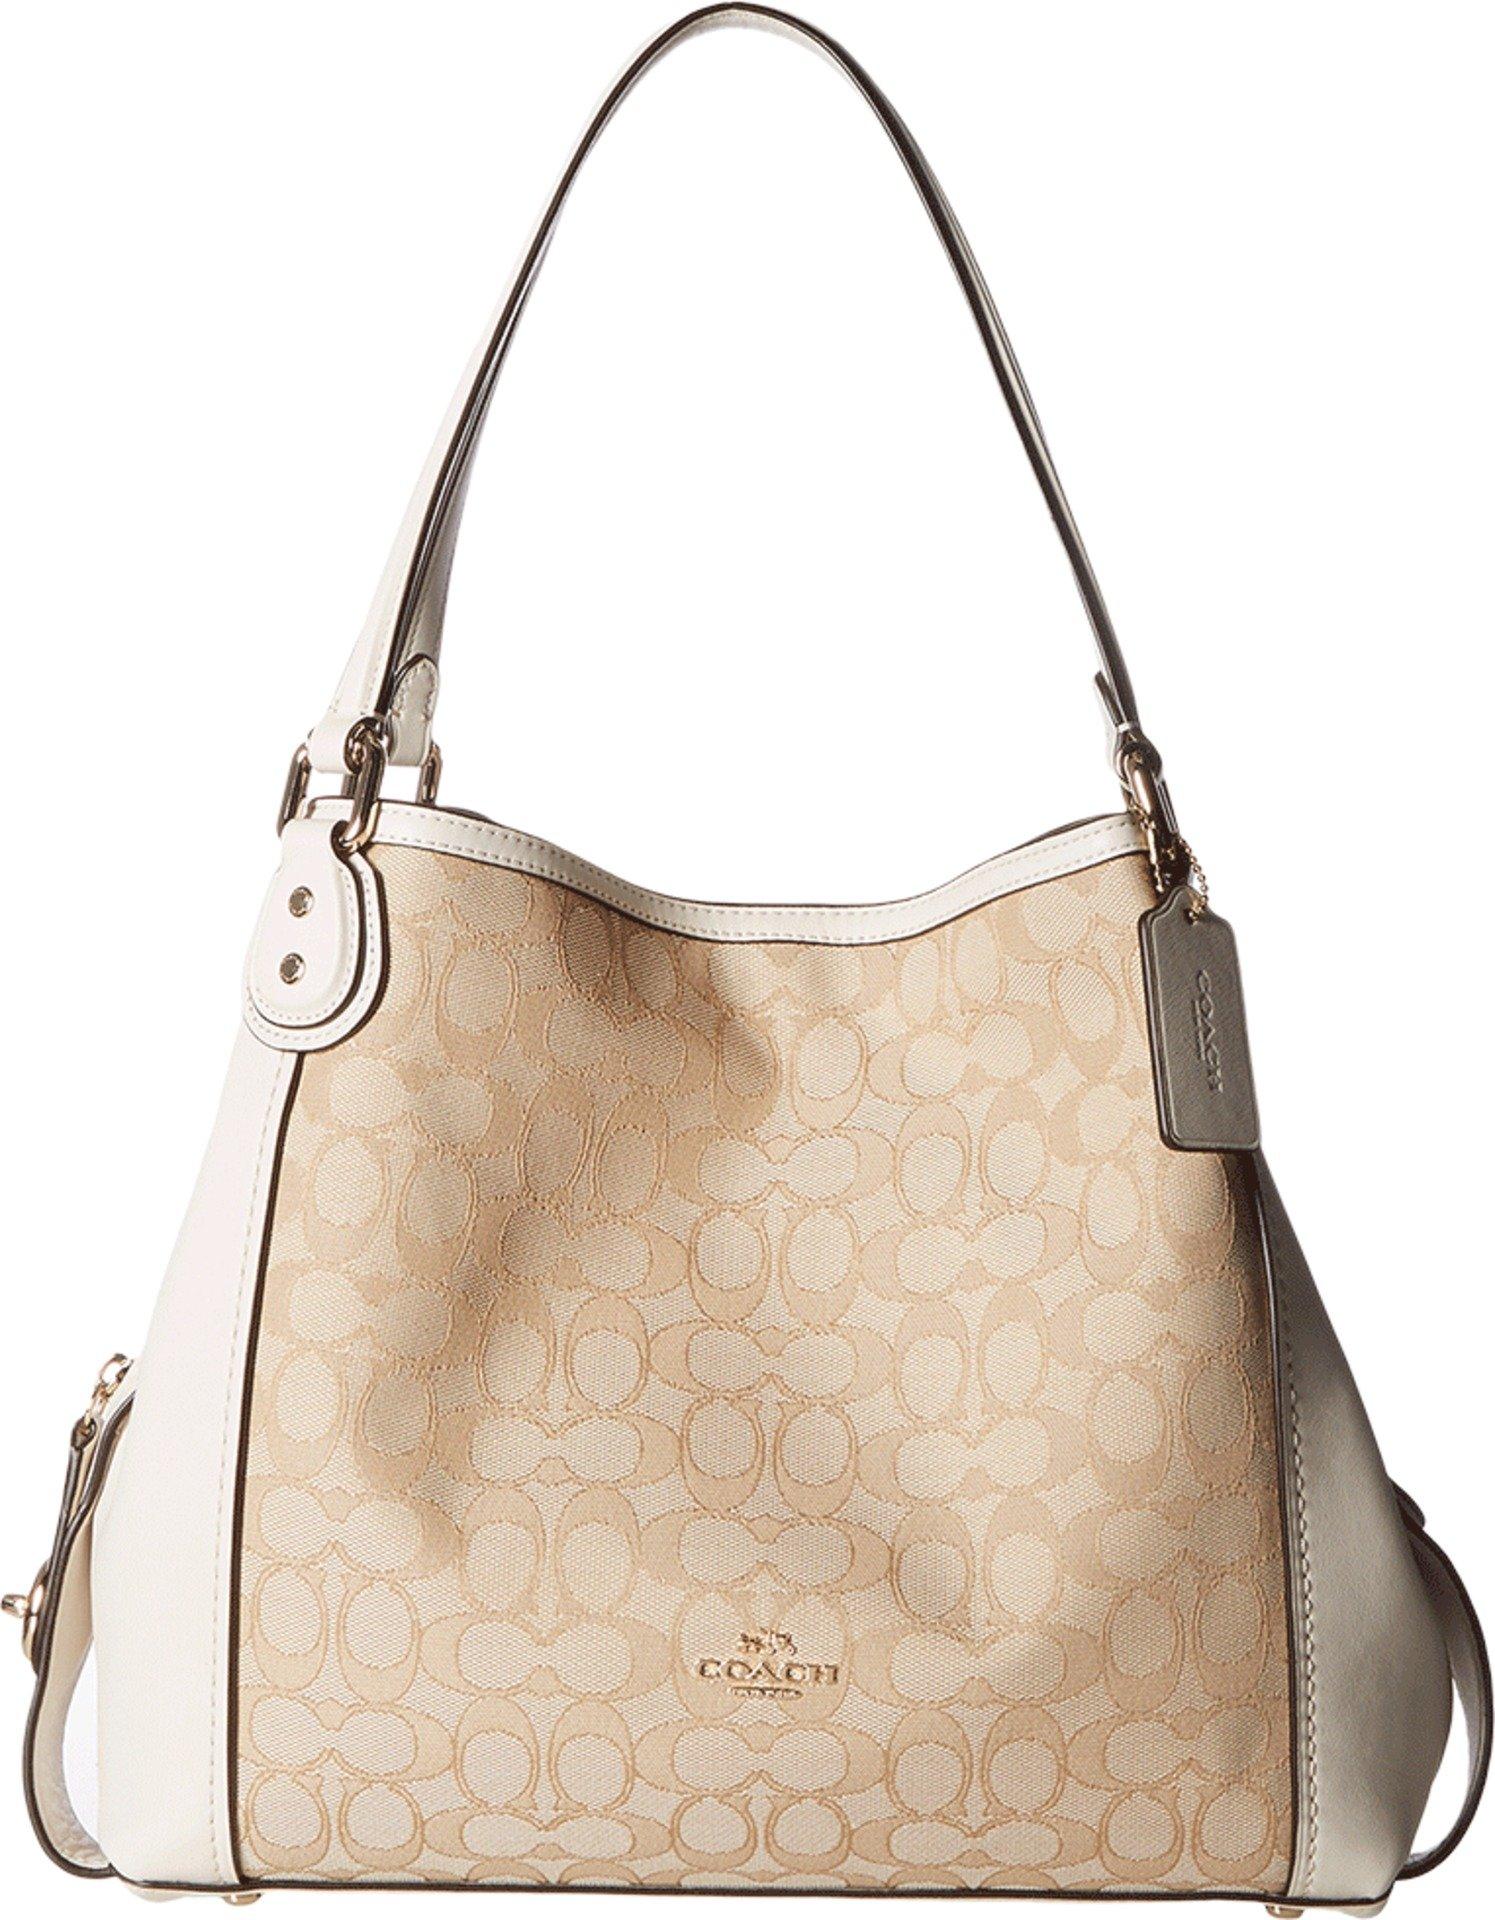 COACH Women's Signature Edie 31 Shoulder Bag LI/Light Khaki/Chalk Handbag